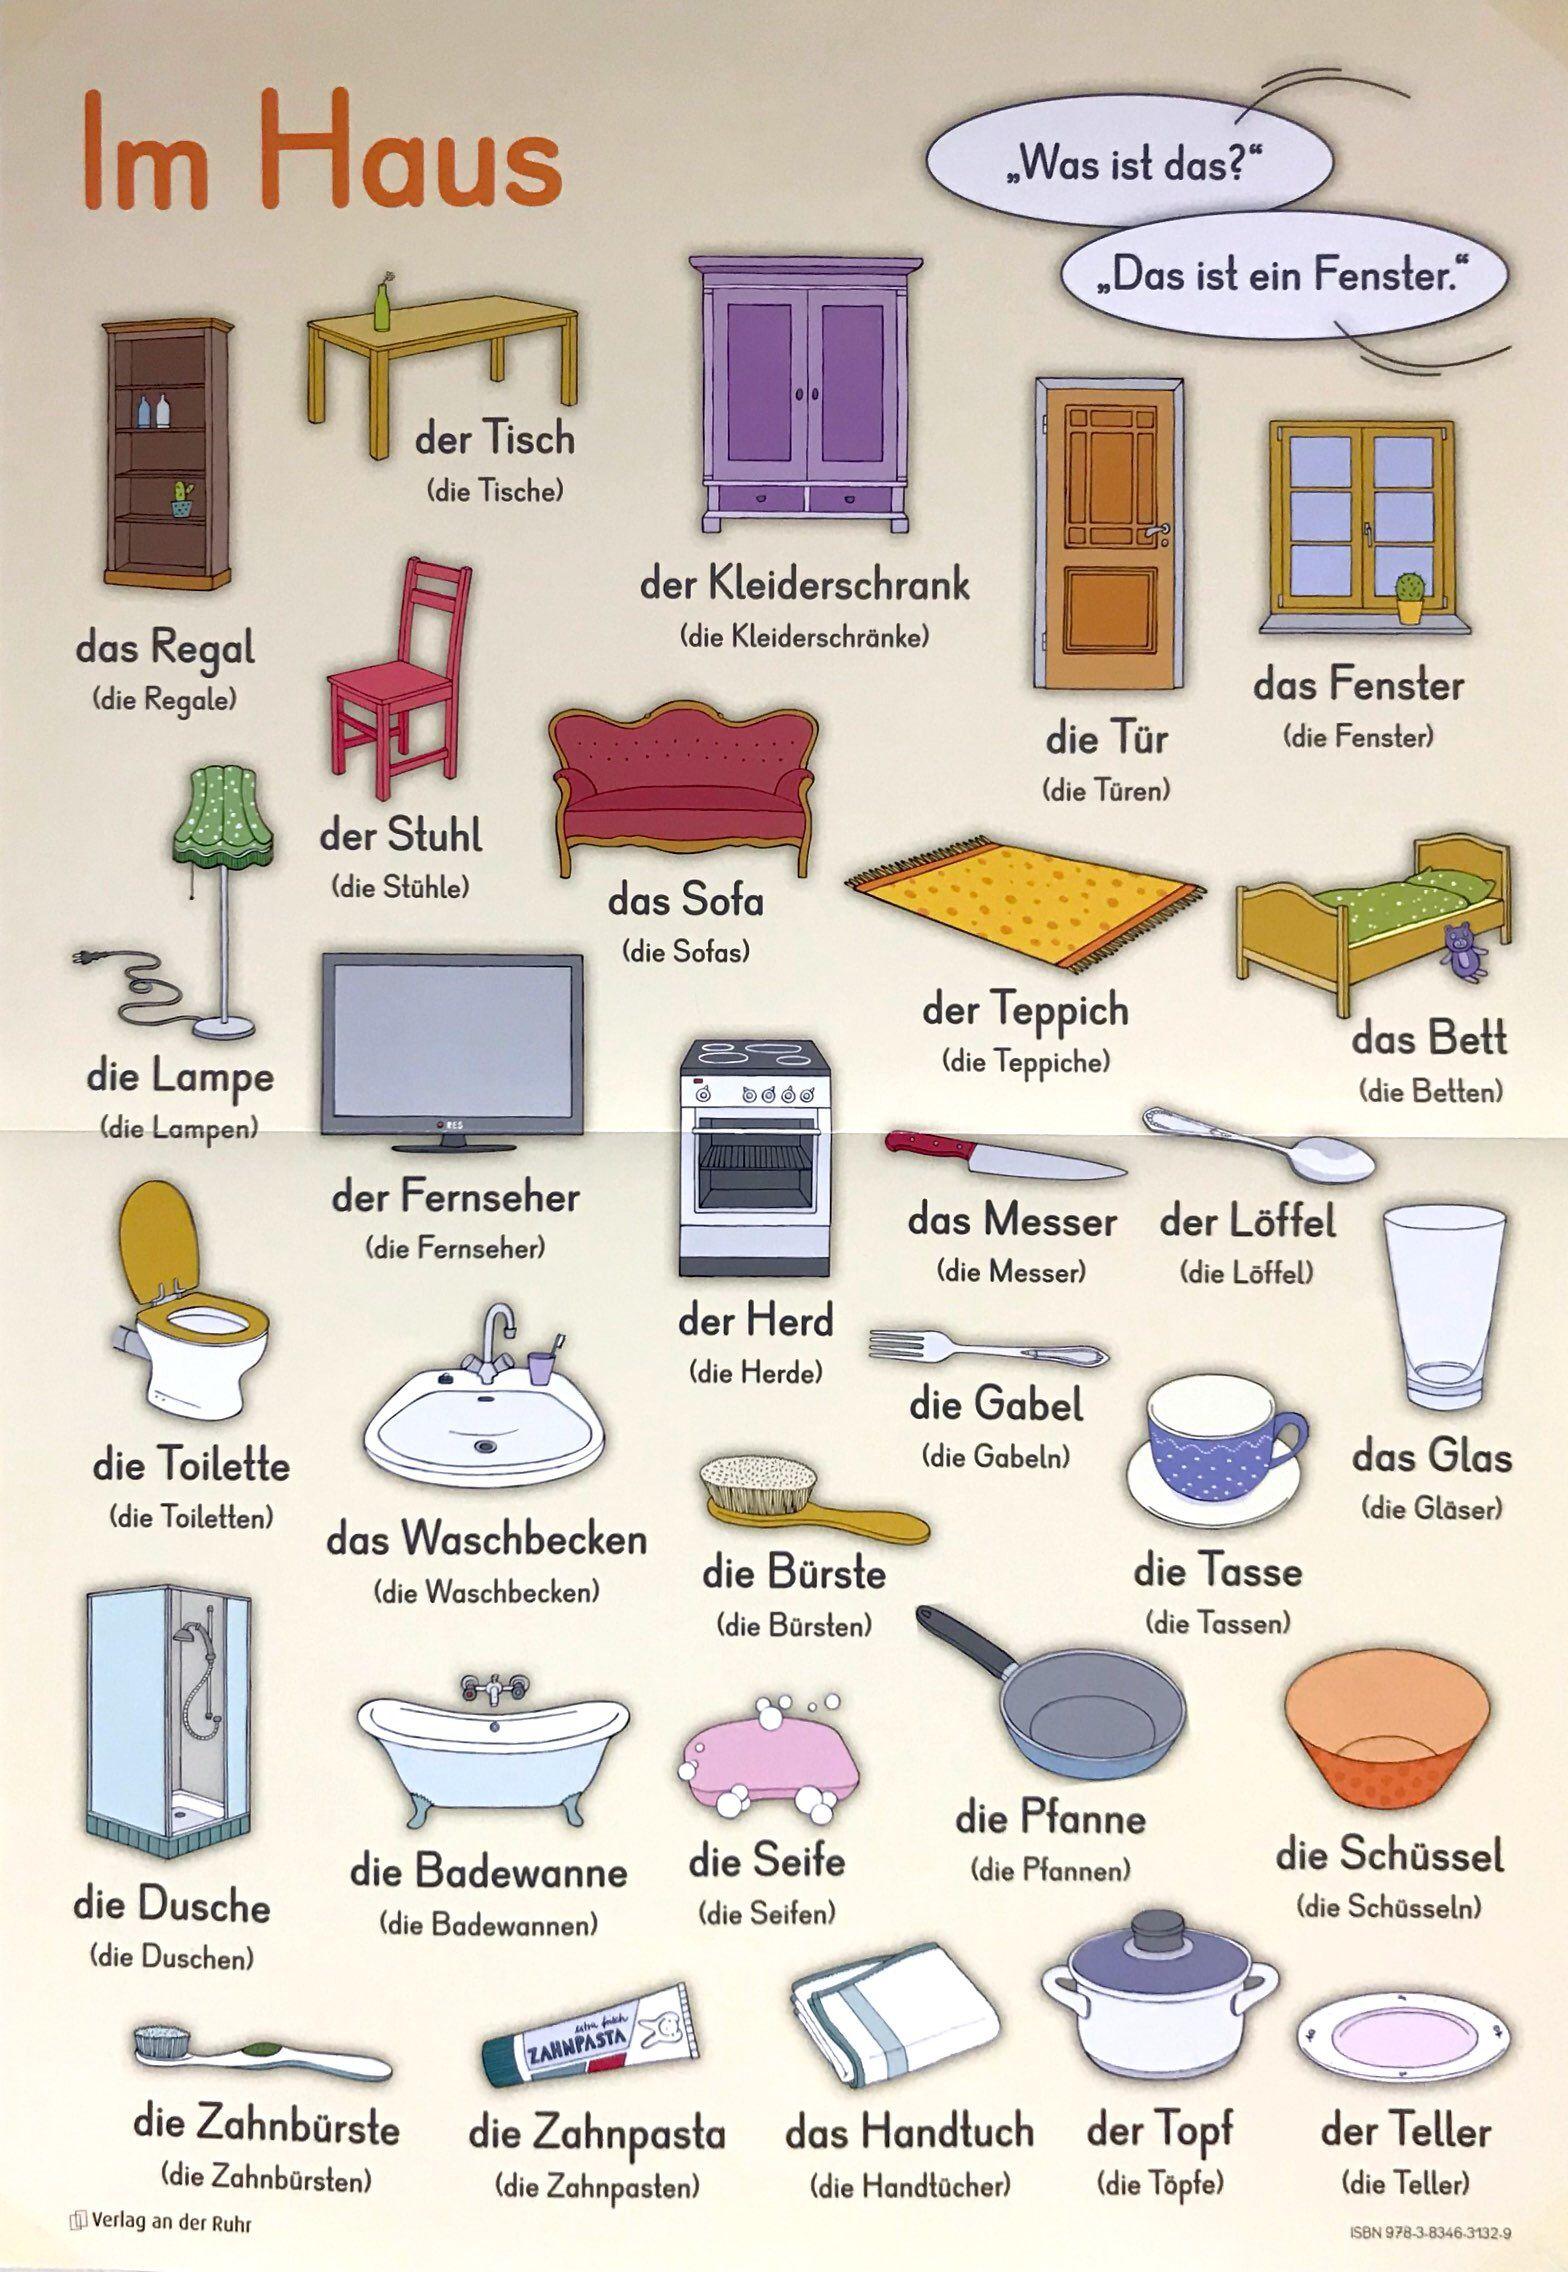 Fenster Plural German Gender Articles And Nouns Ppt Download